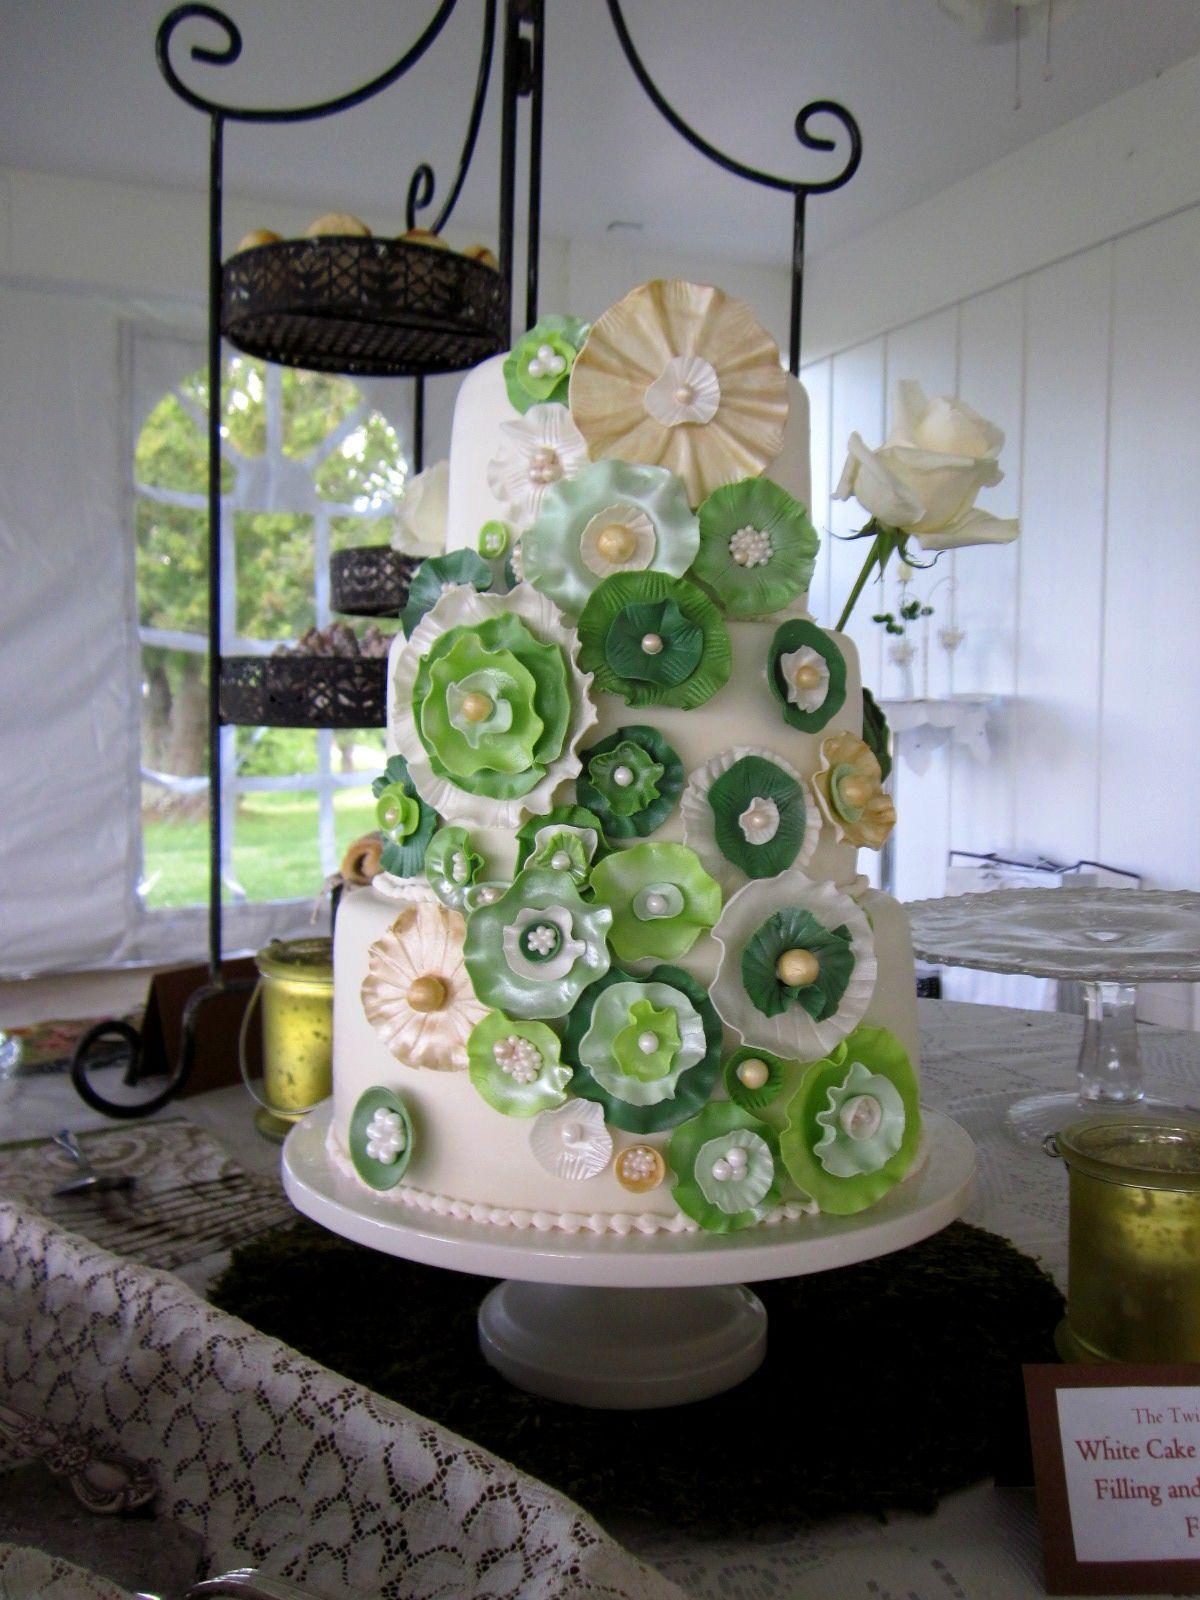 Green Ivory Gold Wedding Cake Ashley Inn Lancaster Ky With Images Green Wedding Cake Gold Wedding Cake Ivory Wedding Cake